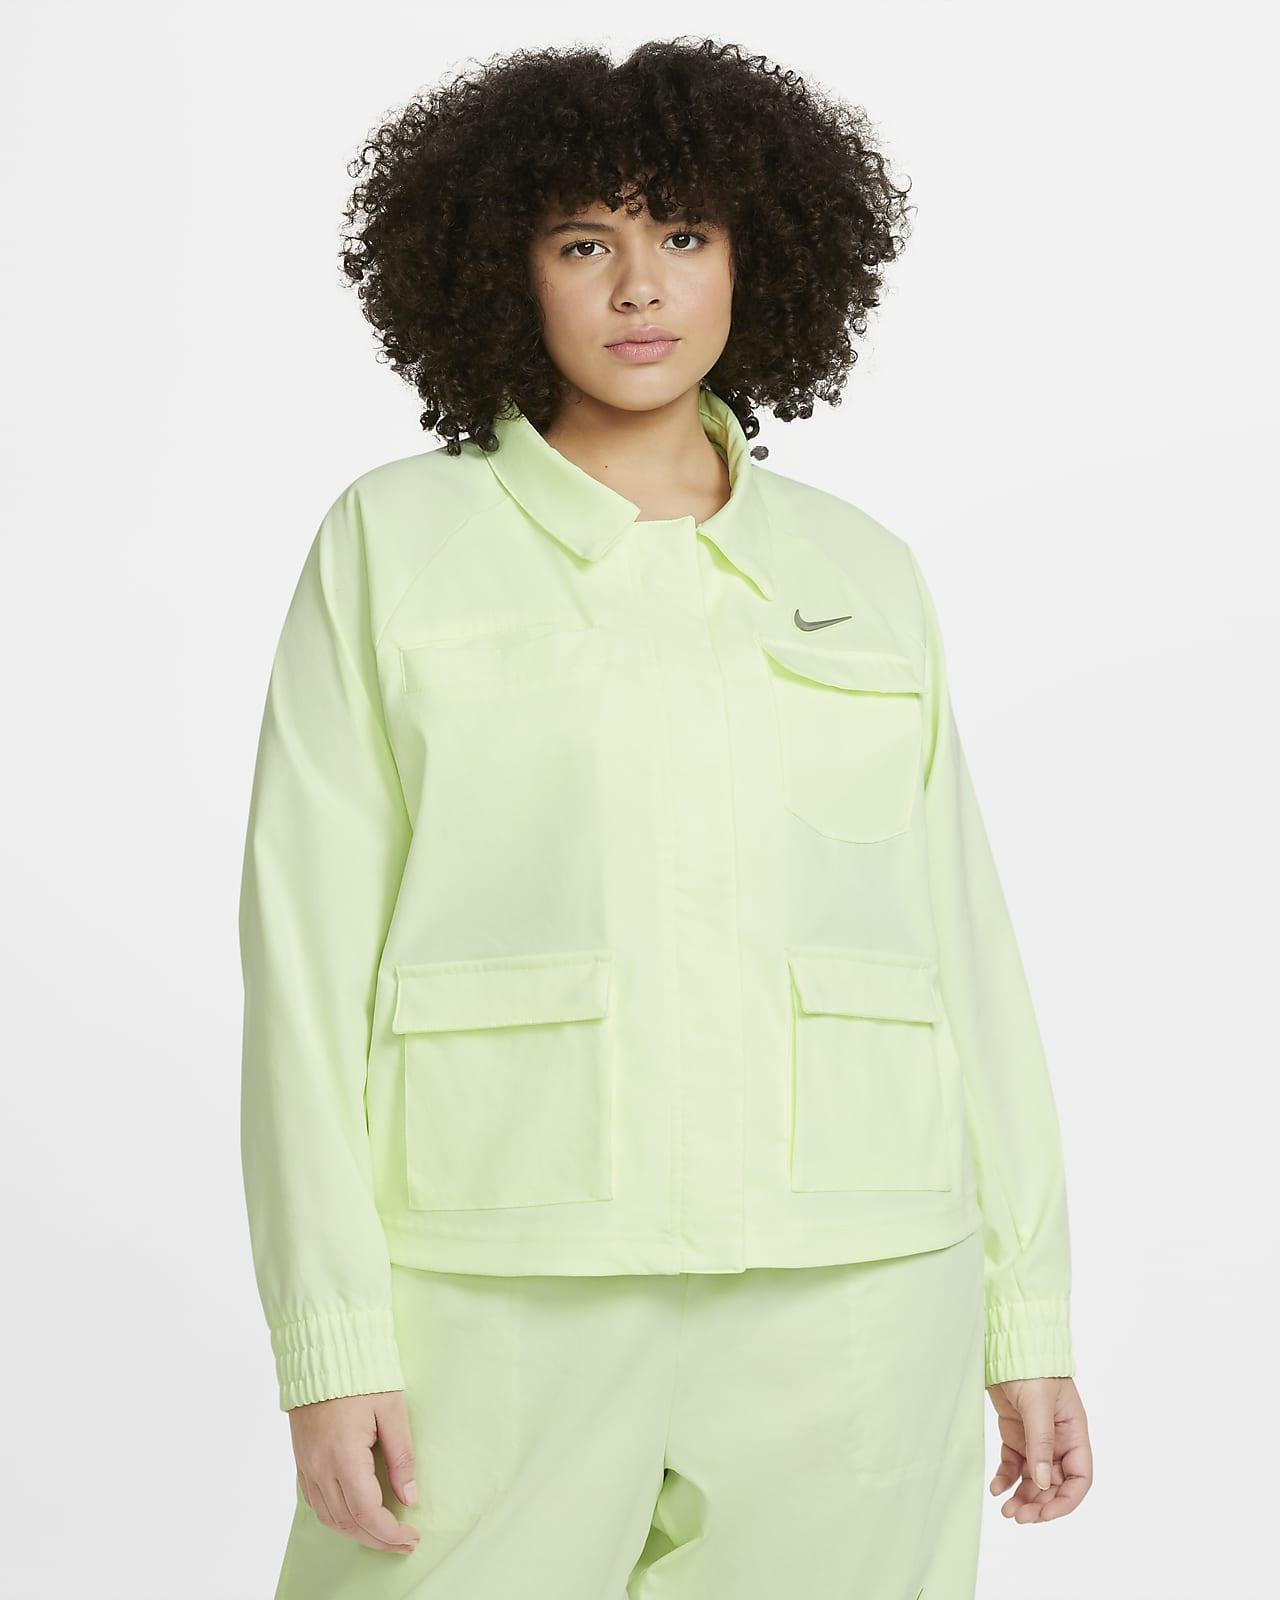 En Vivo Fértil gloria  Nike Sportswear Swoosh Women's Jacket (Plus Size). Nike.com